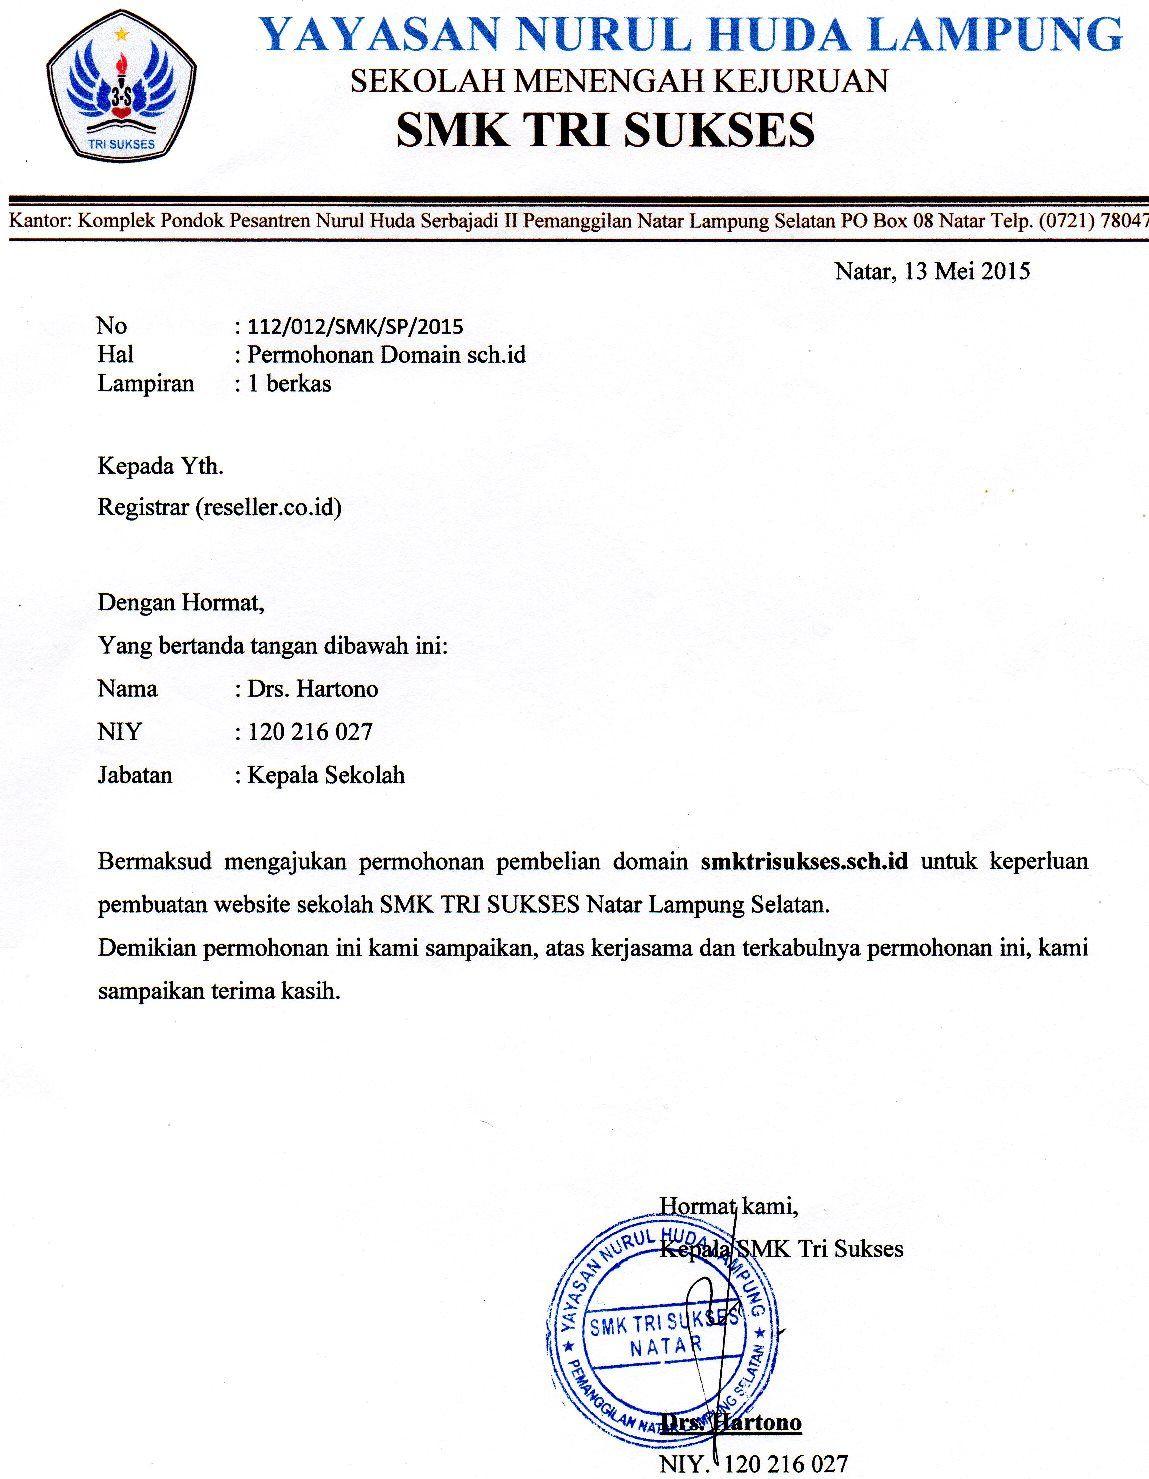 Contoh Surat Lamaran Kerja Indomaret Lampung Contoh Lif Co Id